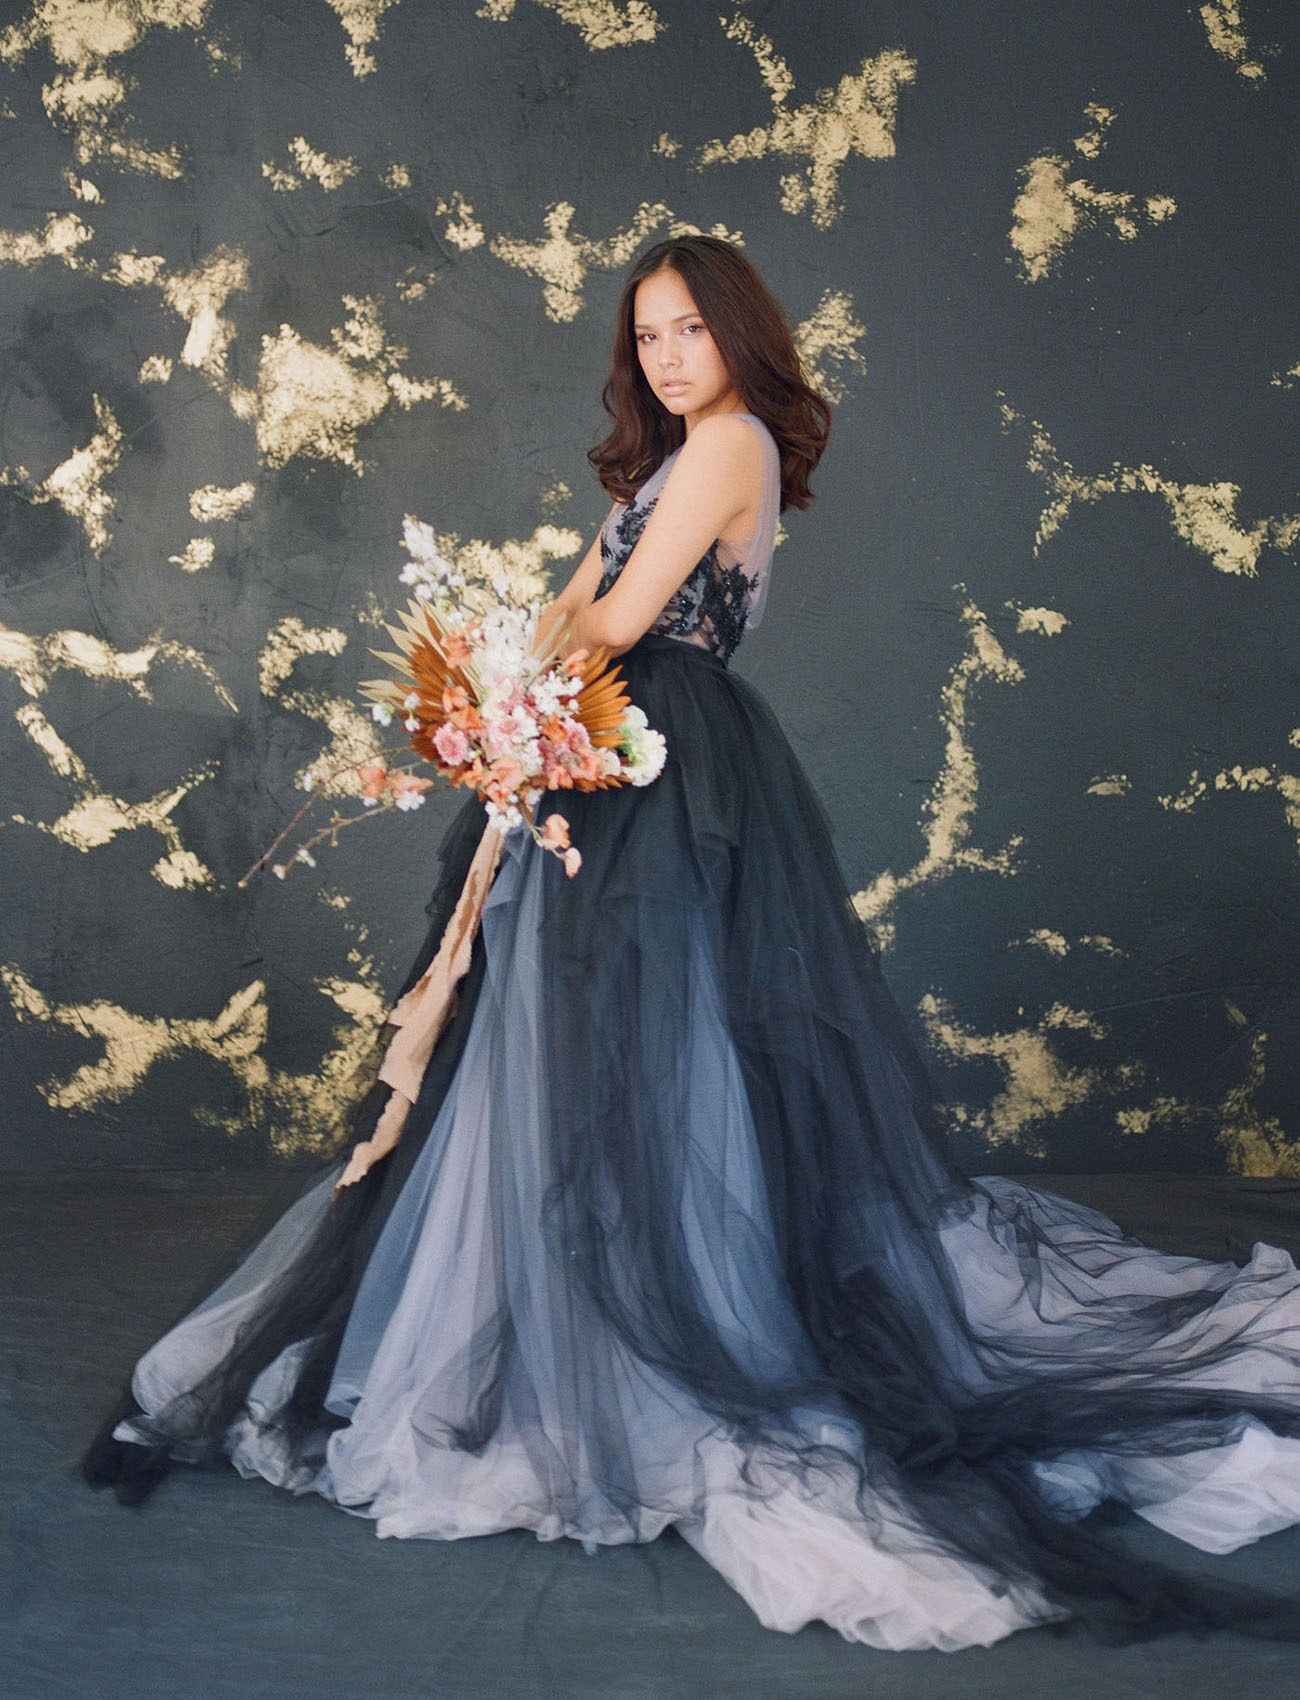 black and purple ballgown wedding dress